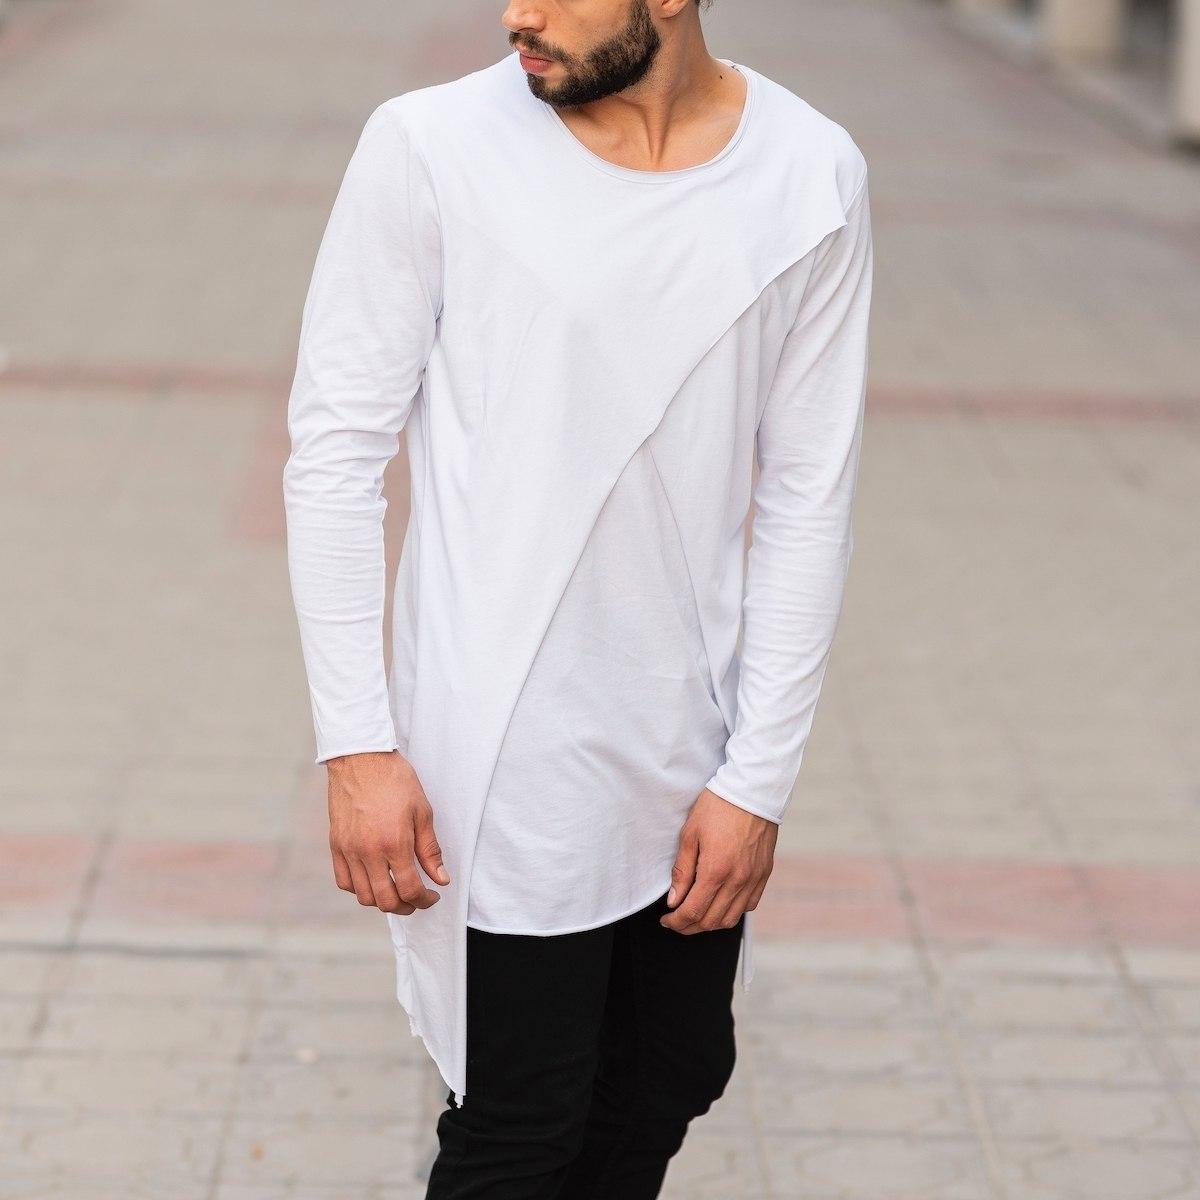 Double Textured Sweatshirt In White Mv Premium Brand - 2